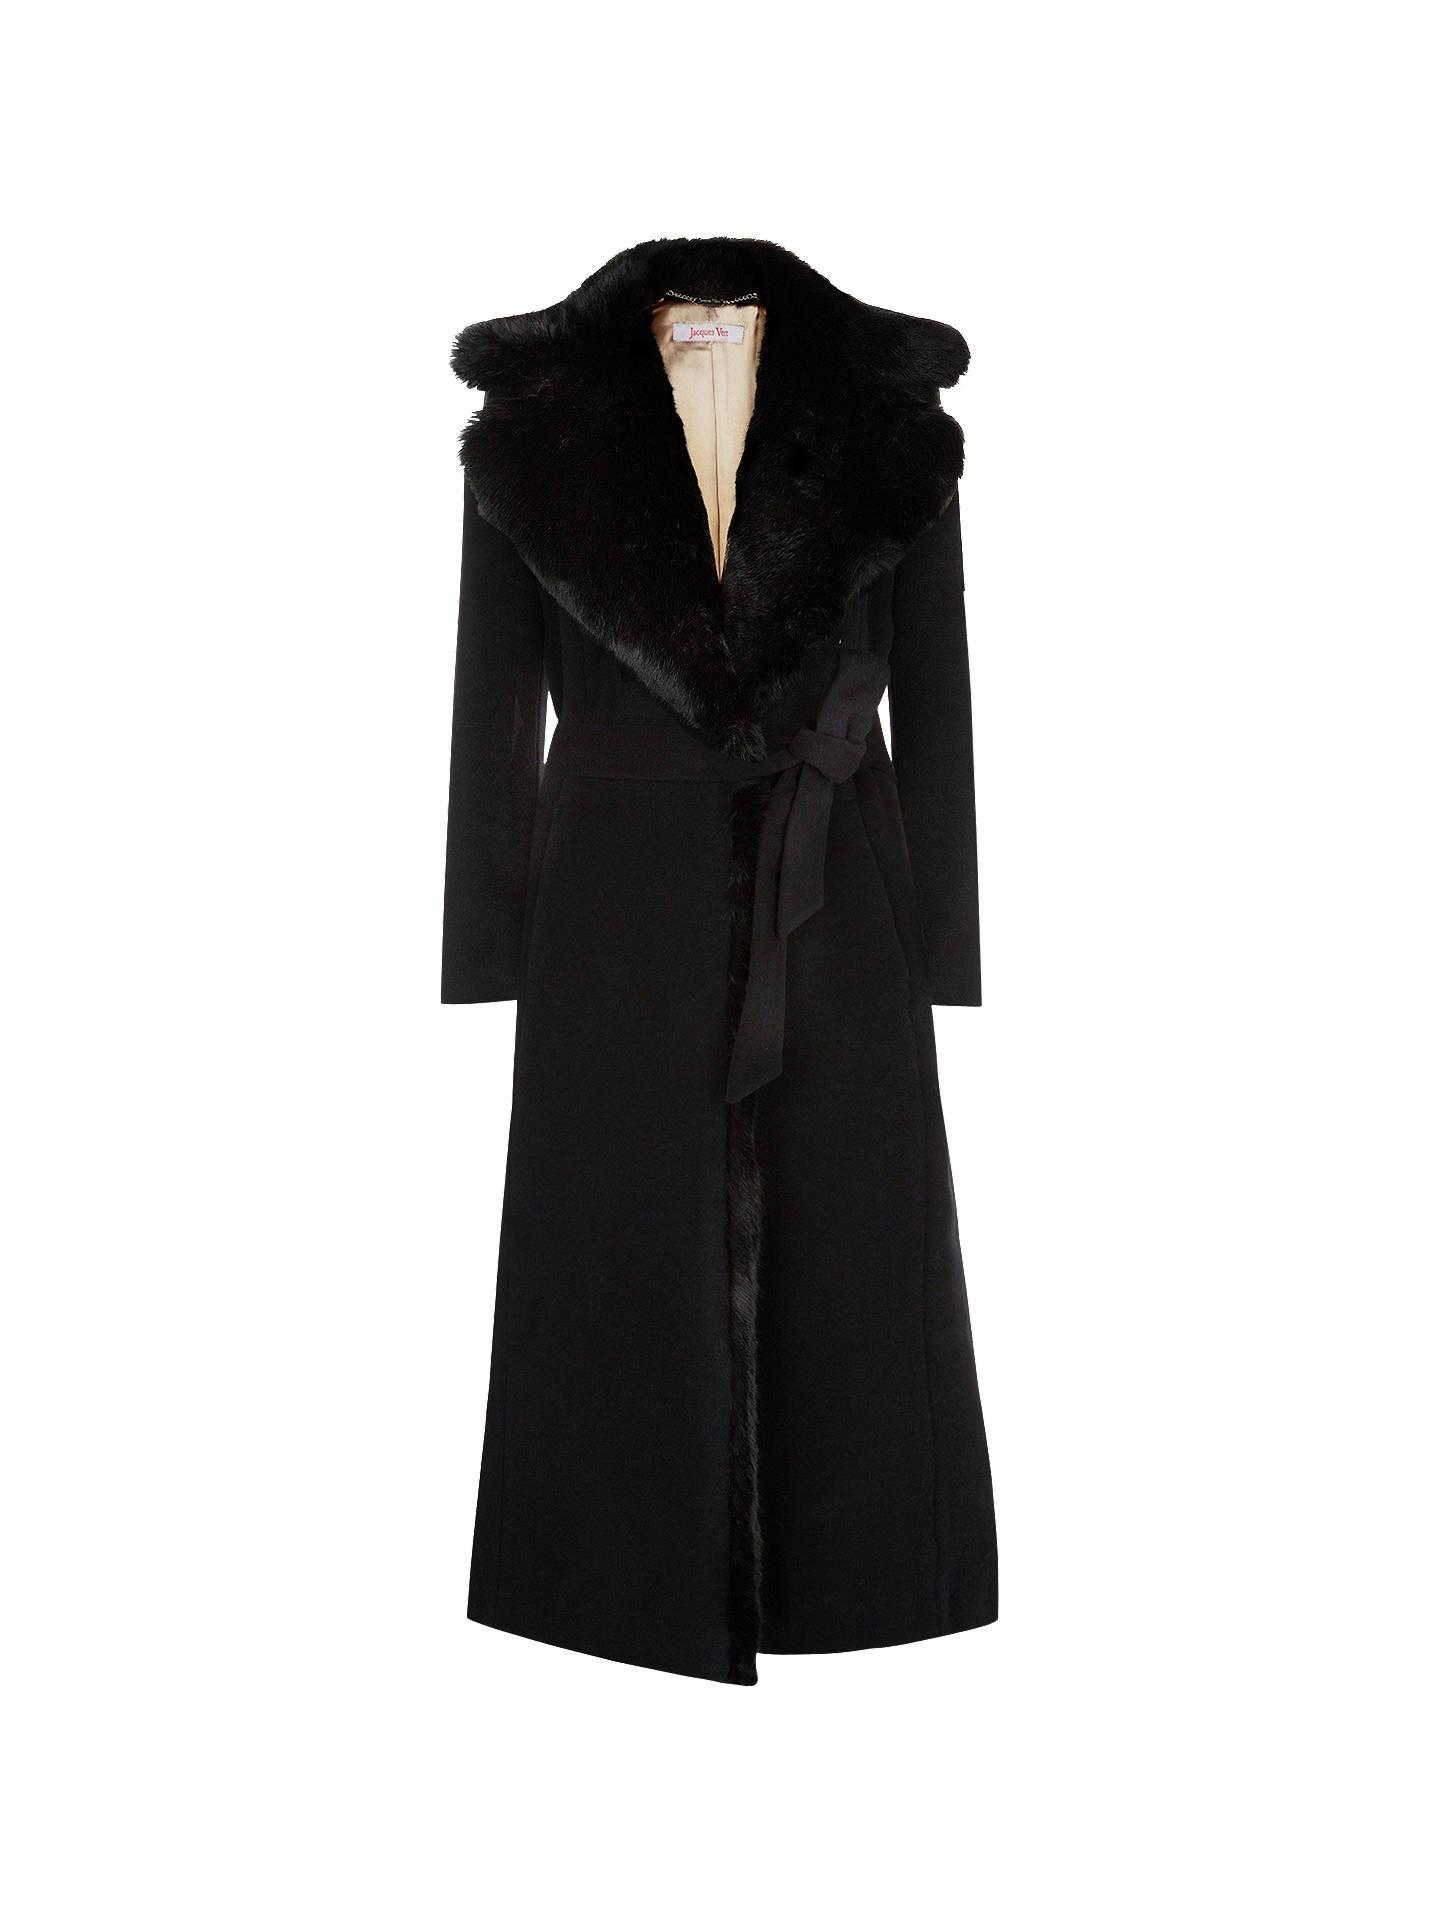 2b9cfce04 Buy Jacques Vert Long Faux Fur Collar Wrap Coat, Black, 8 Online at  johnlewis ...